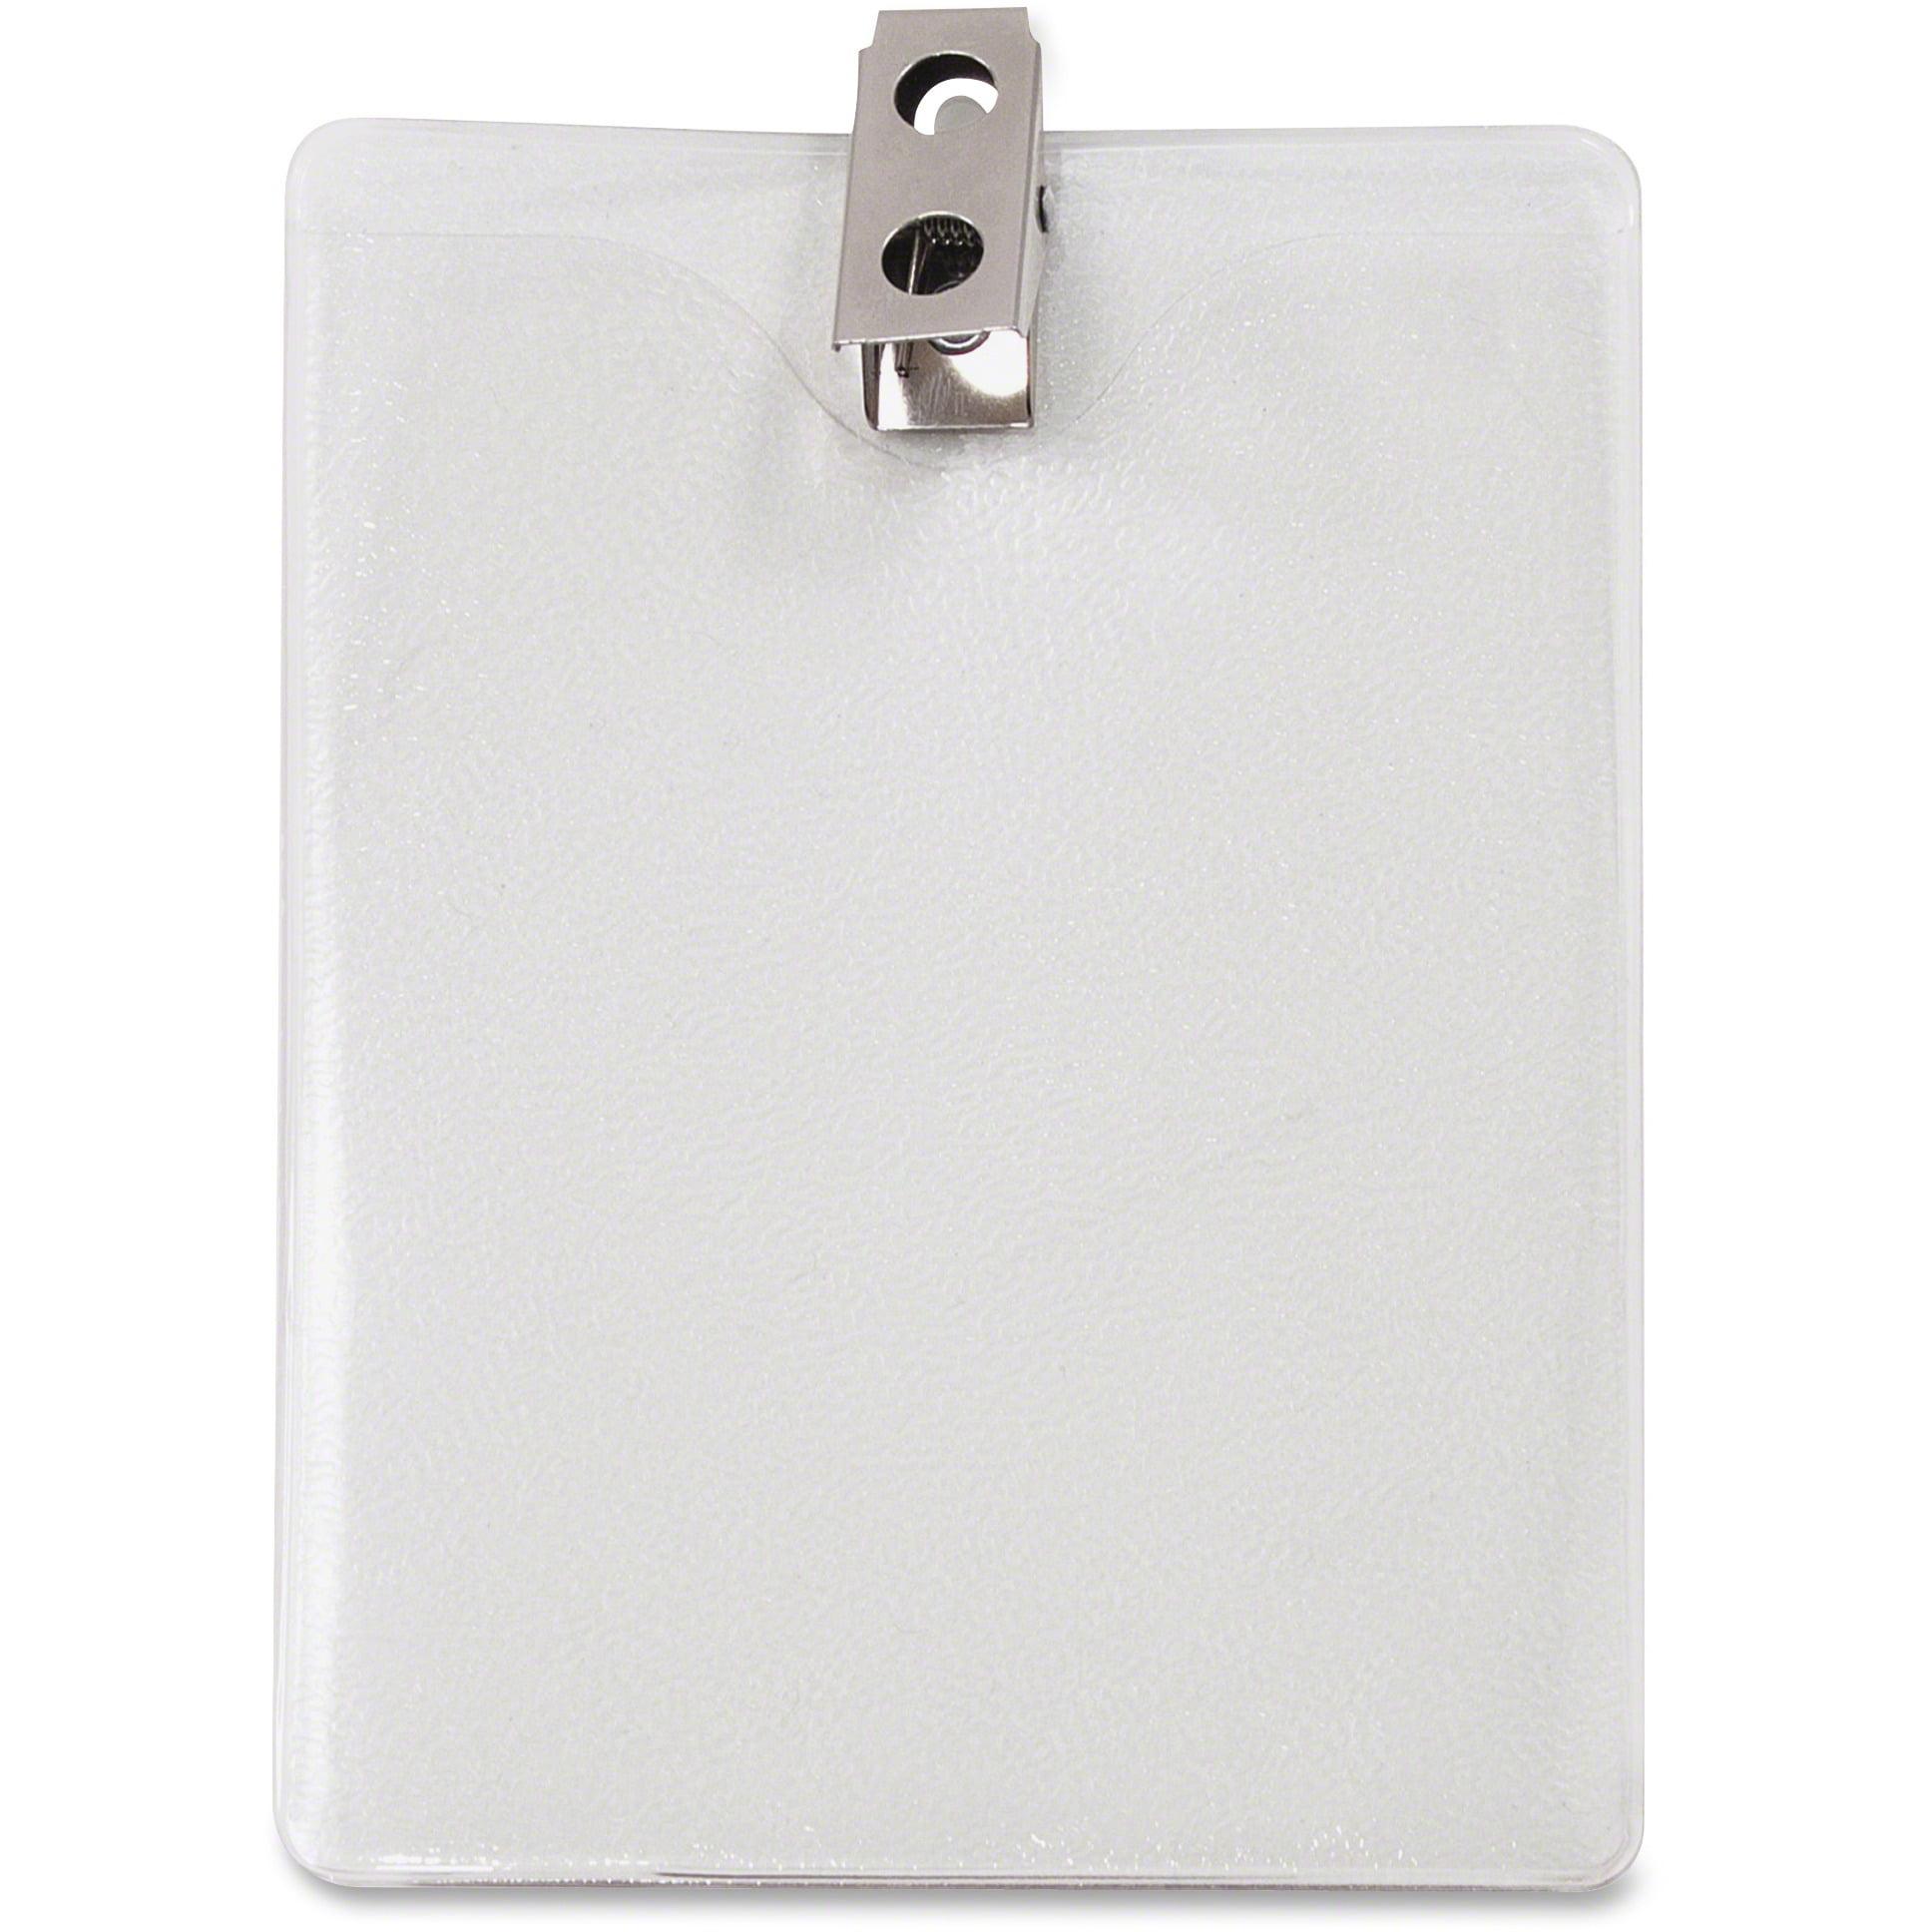 Advantus ID Badge Holder w Clip, Vertical, 3w x 4h, Clear, 50 Pack by Advantus Corp